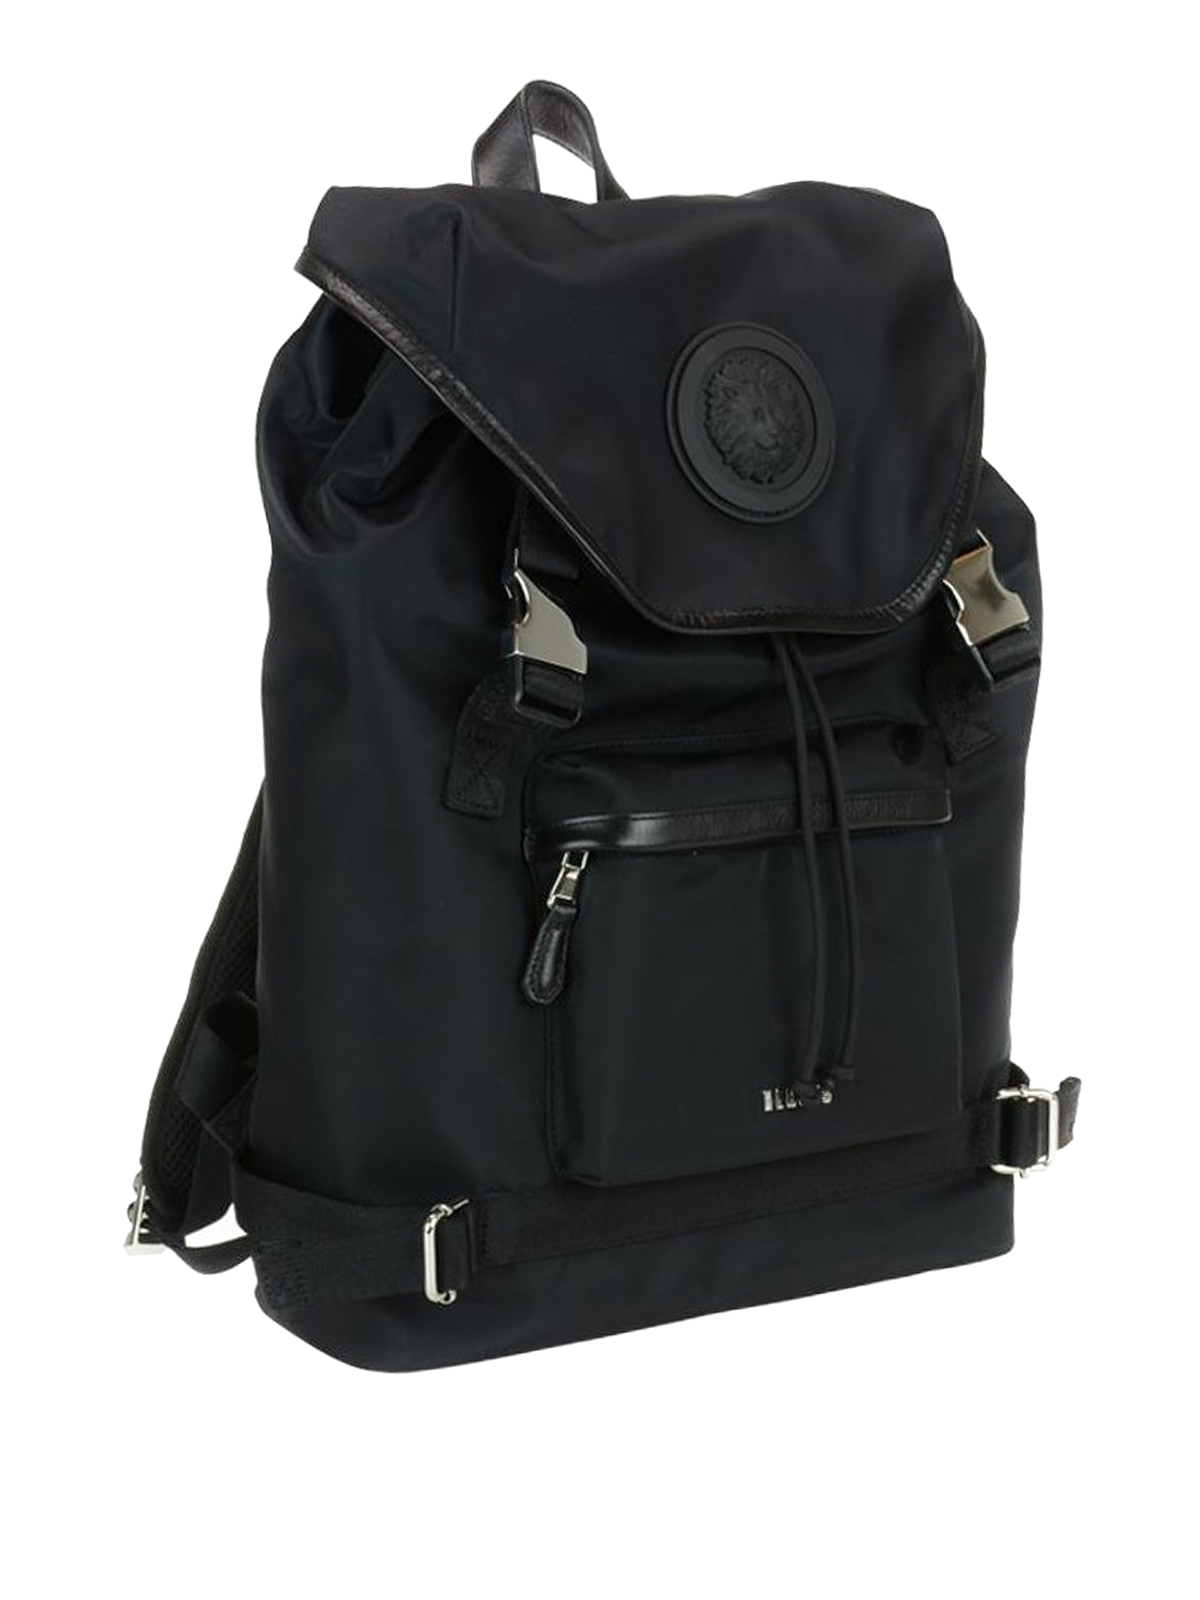 Versus Versace  backpacks online - Lion Head detailed nylon backpack 6fdfa8b566c68